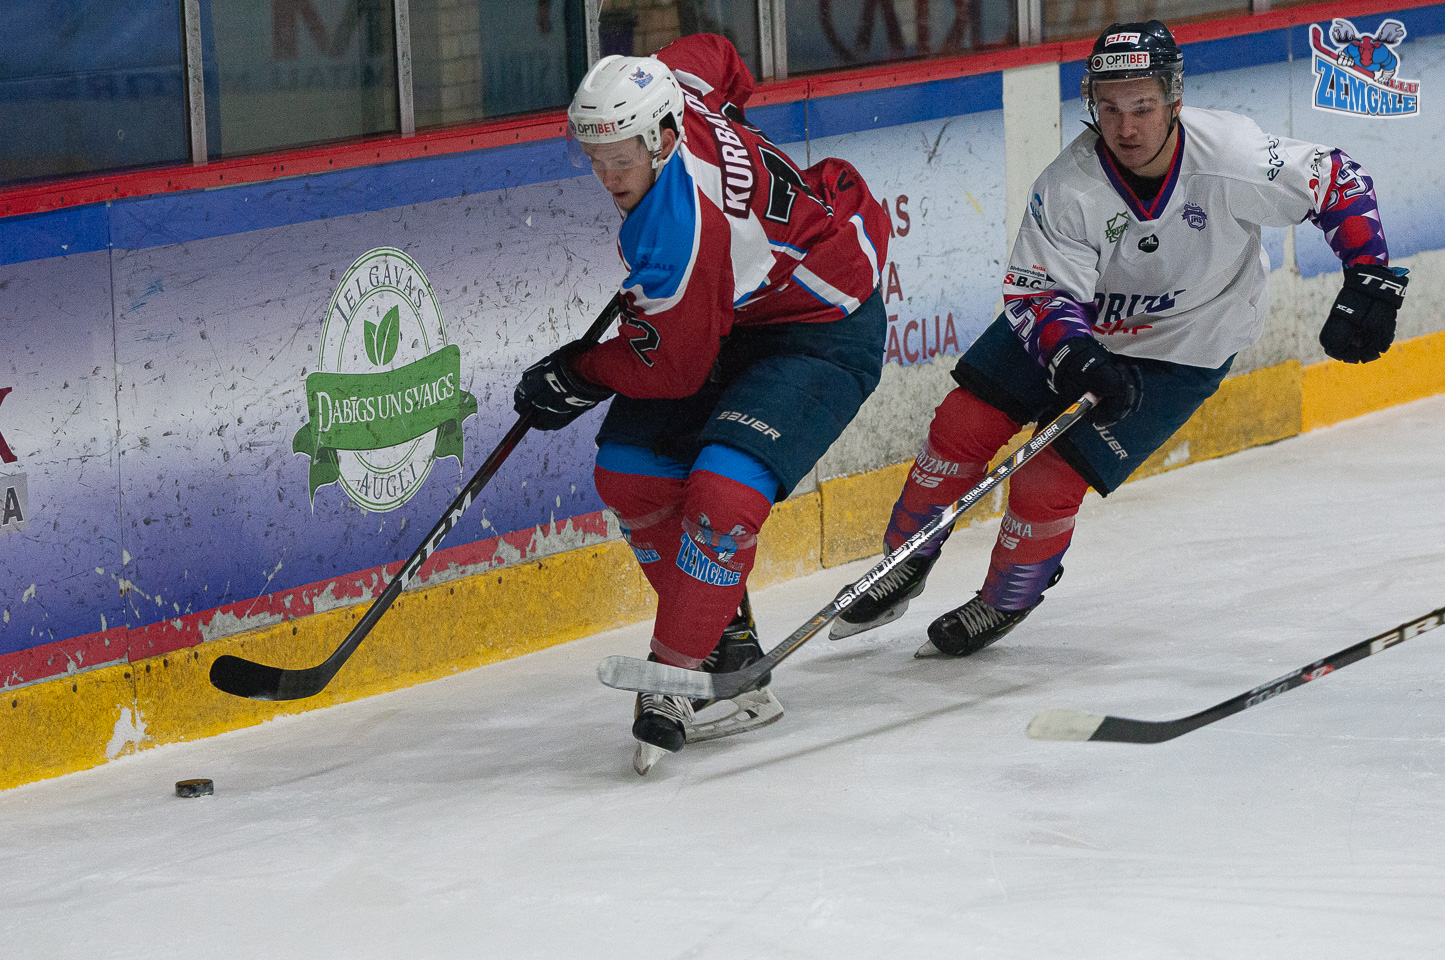 Hokejisti cīnās par ripas kontroli